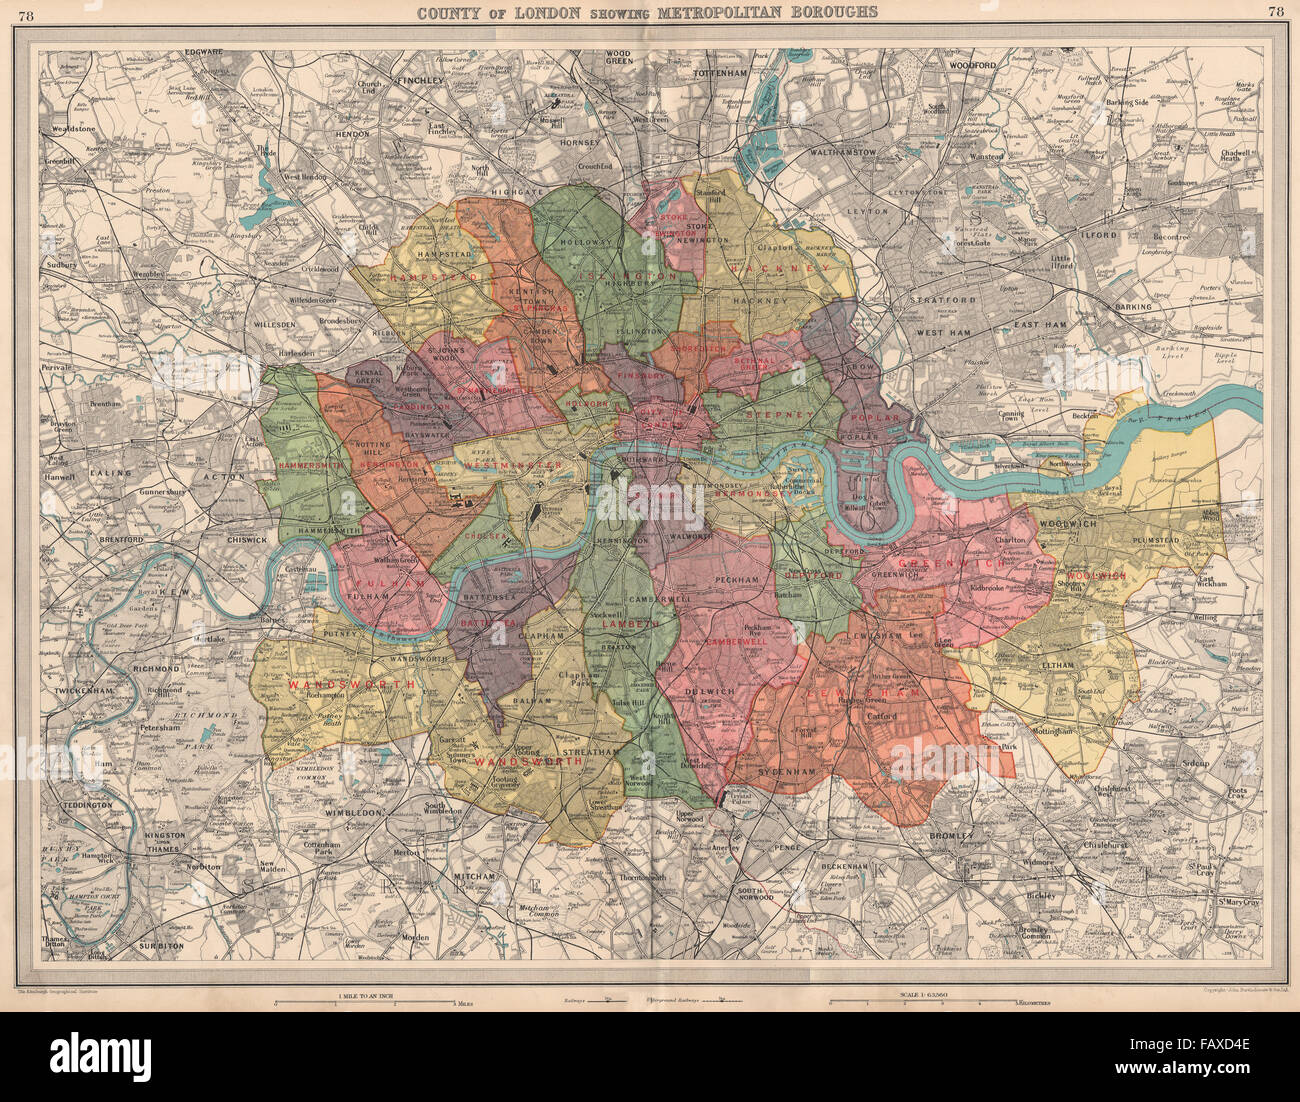 County Of London Showing Metropolitan Boroughs Railways Tube – Large London Map